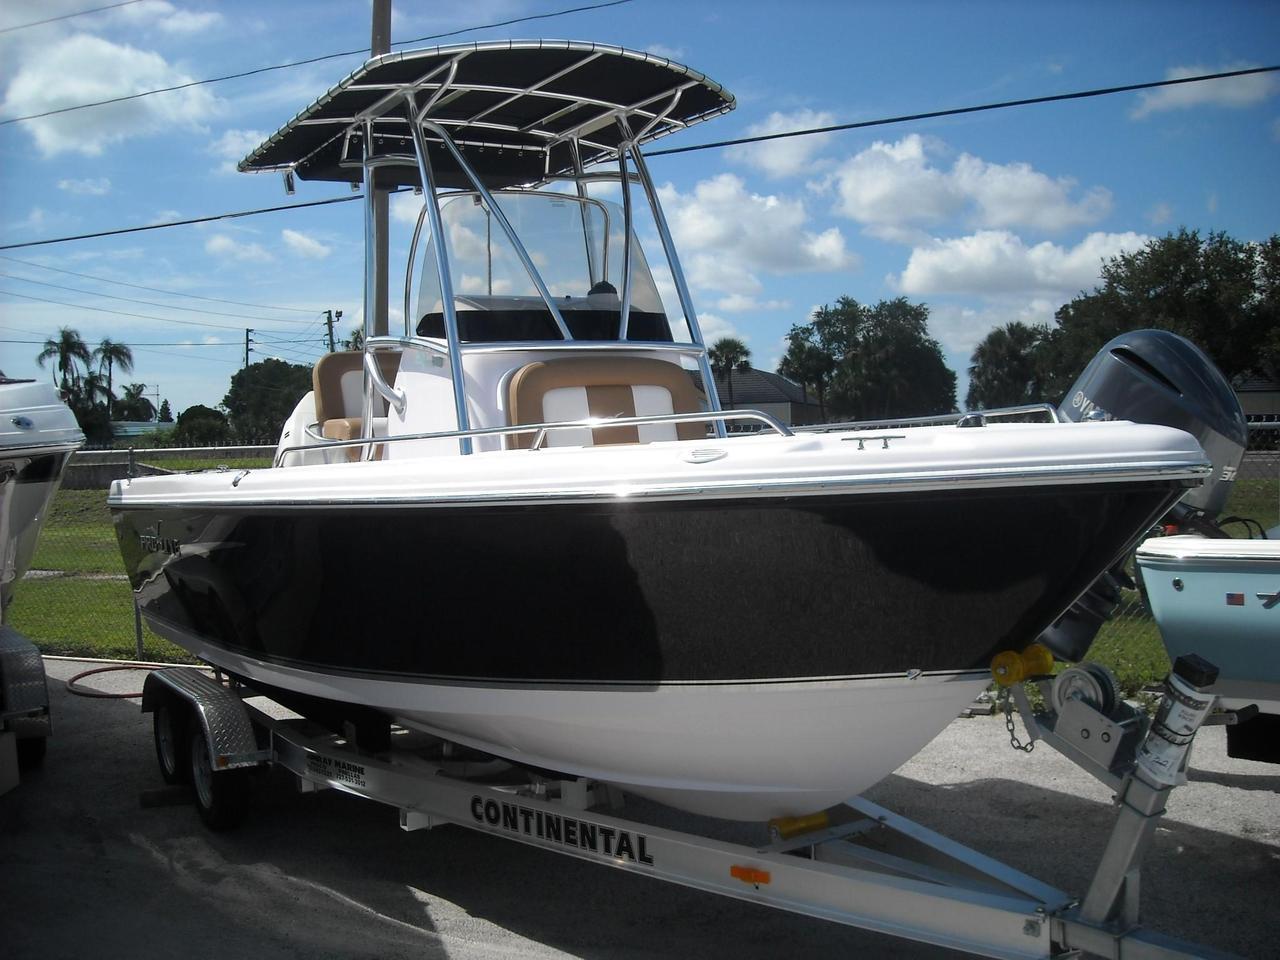 2017 new pro line 20 sport center console fishing boat for for Sport fishing boats for sale